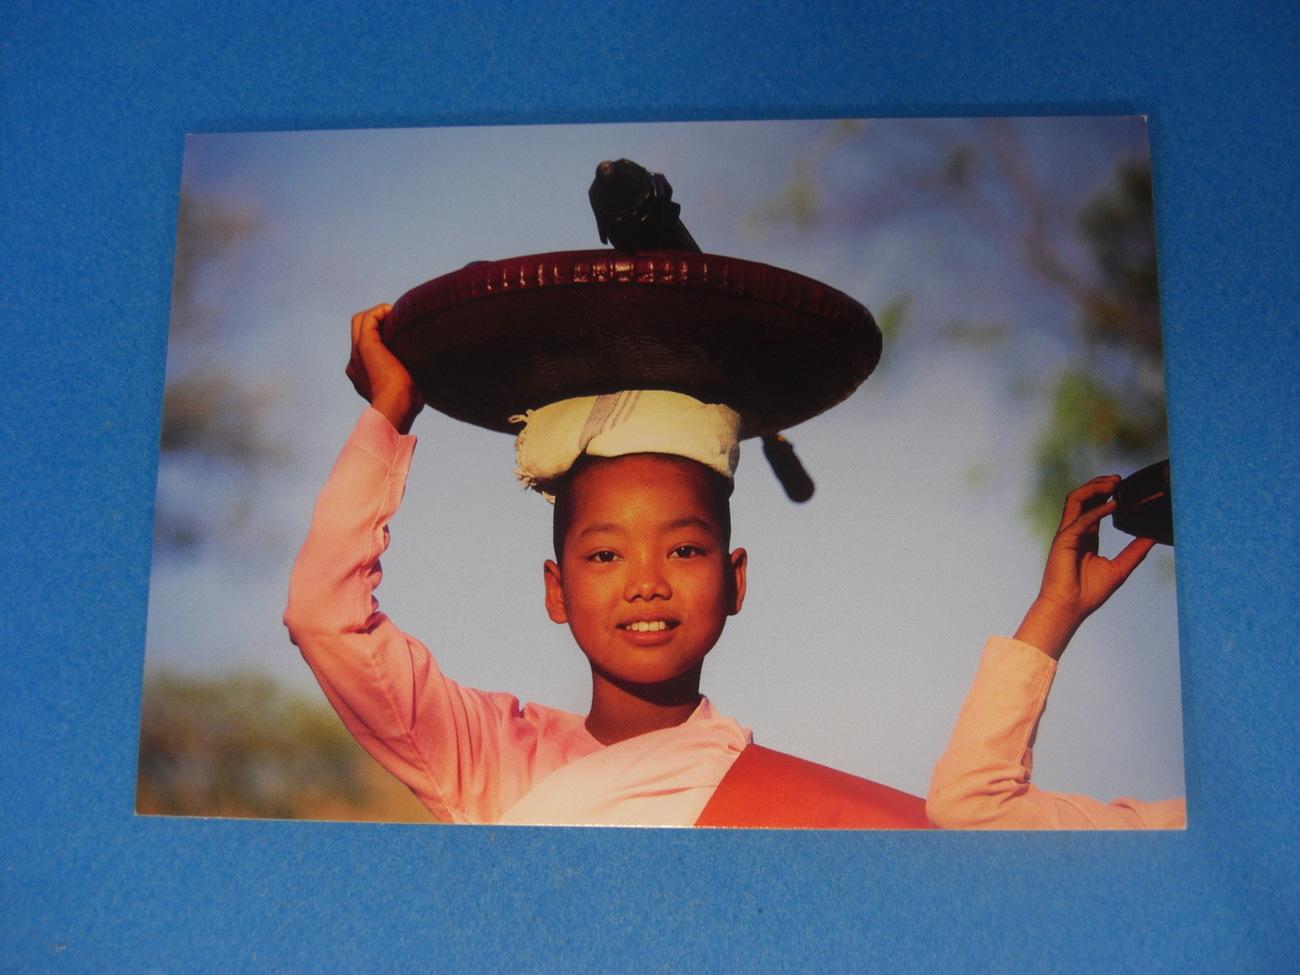 Novice Nun Carrying a Basquet Postcard by Frans Lemmens